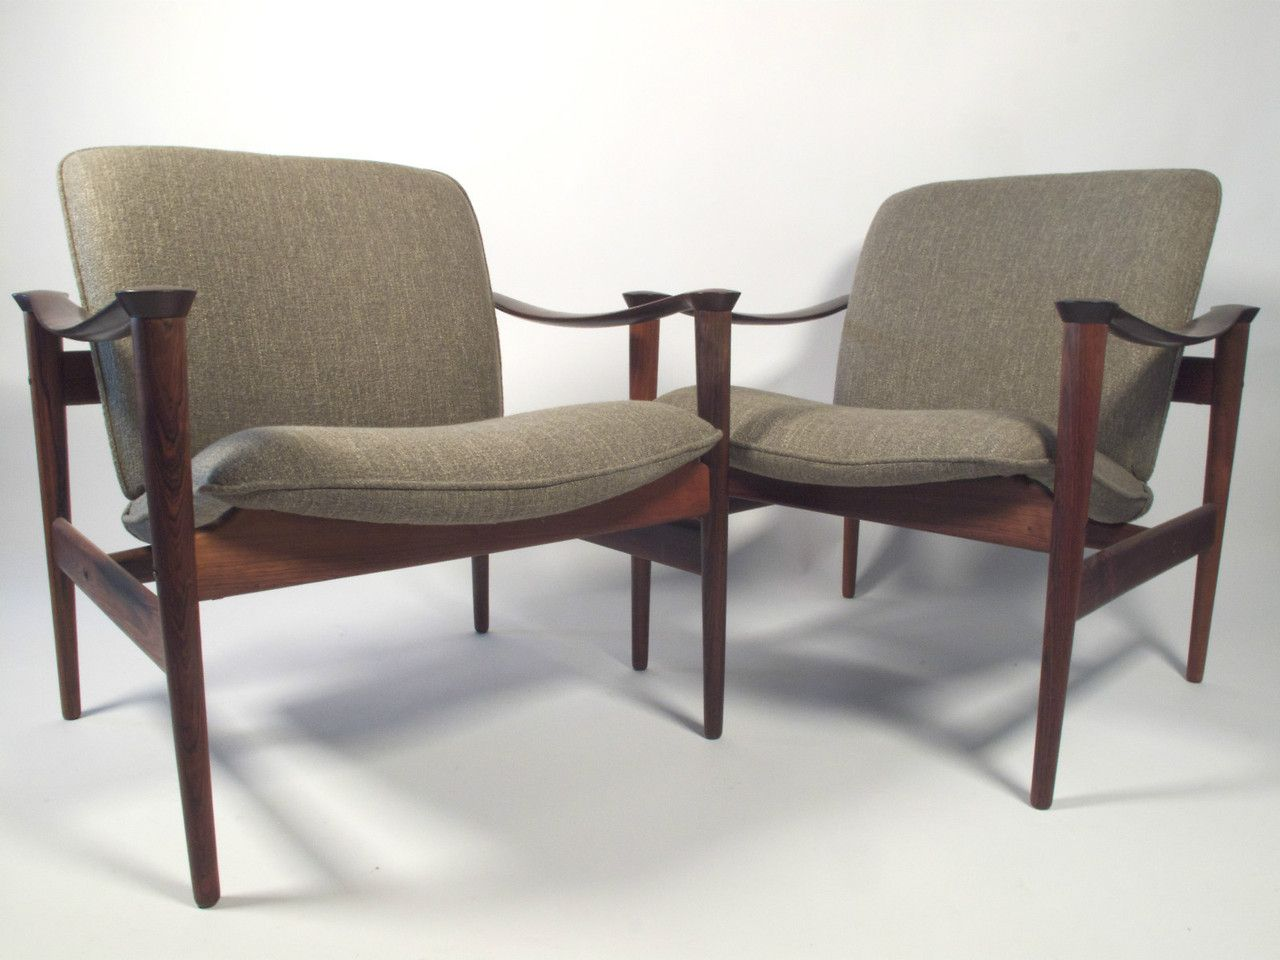 fredrik kayser rosewood model 711 lounge chairs mid. Black Bedroom Furniture Sets. Home Design Ideas